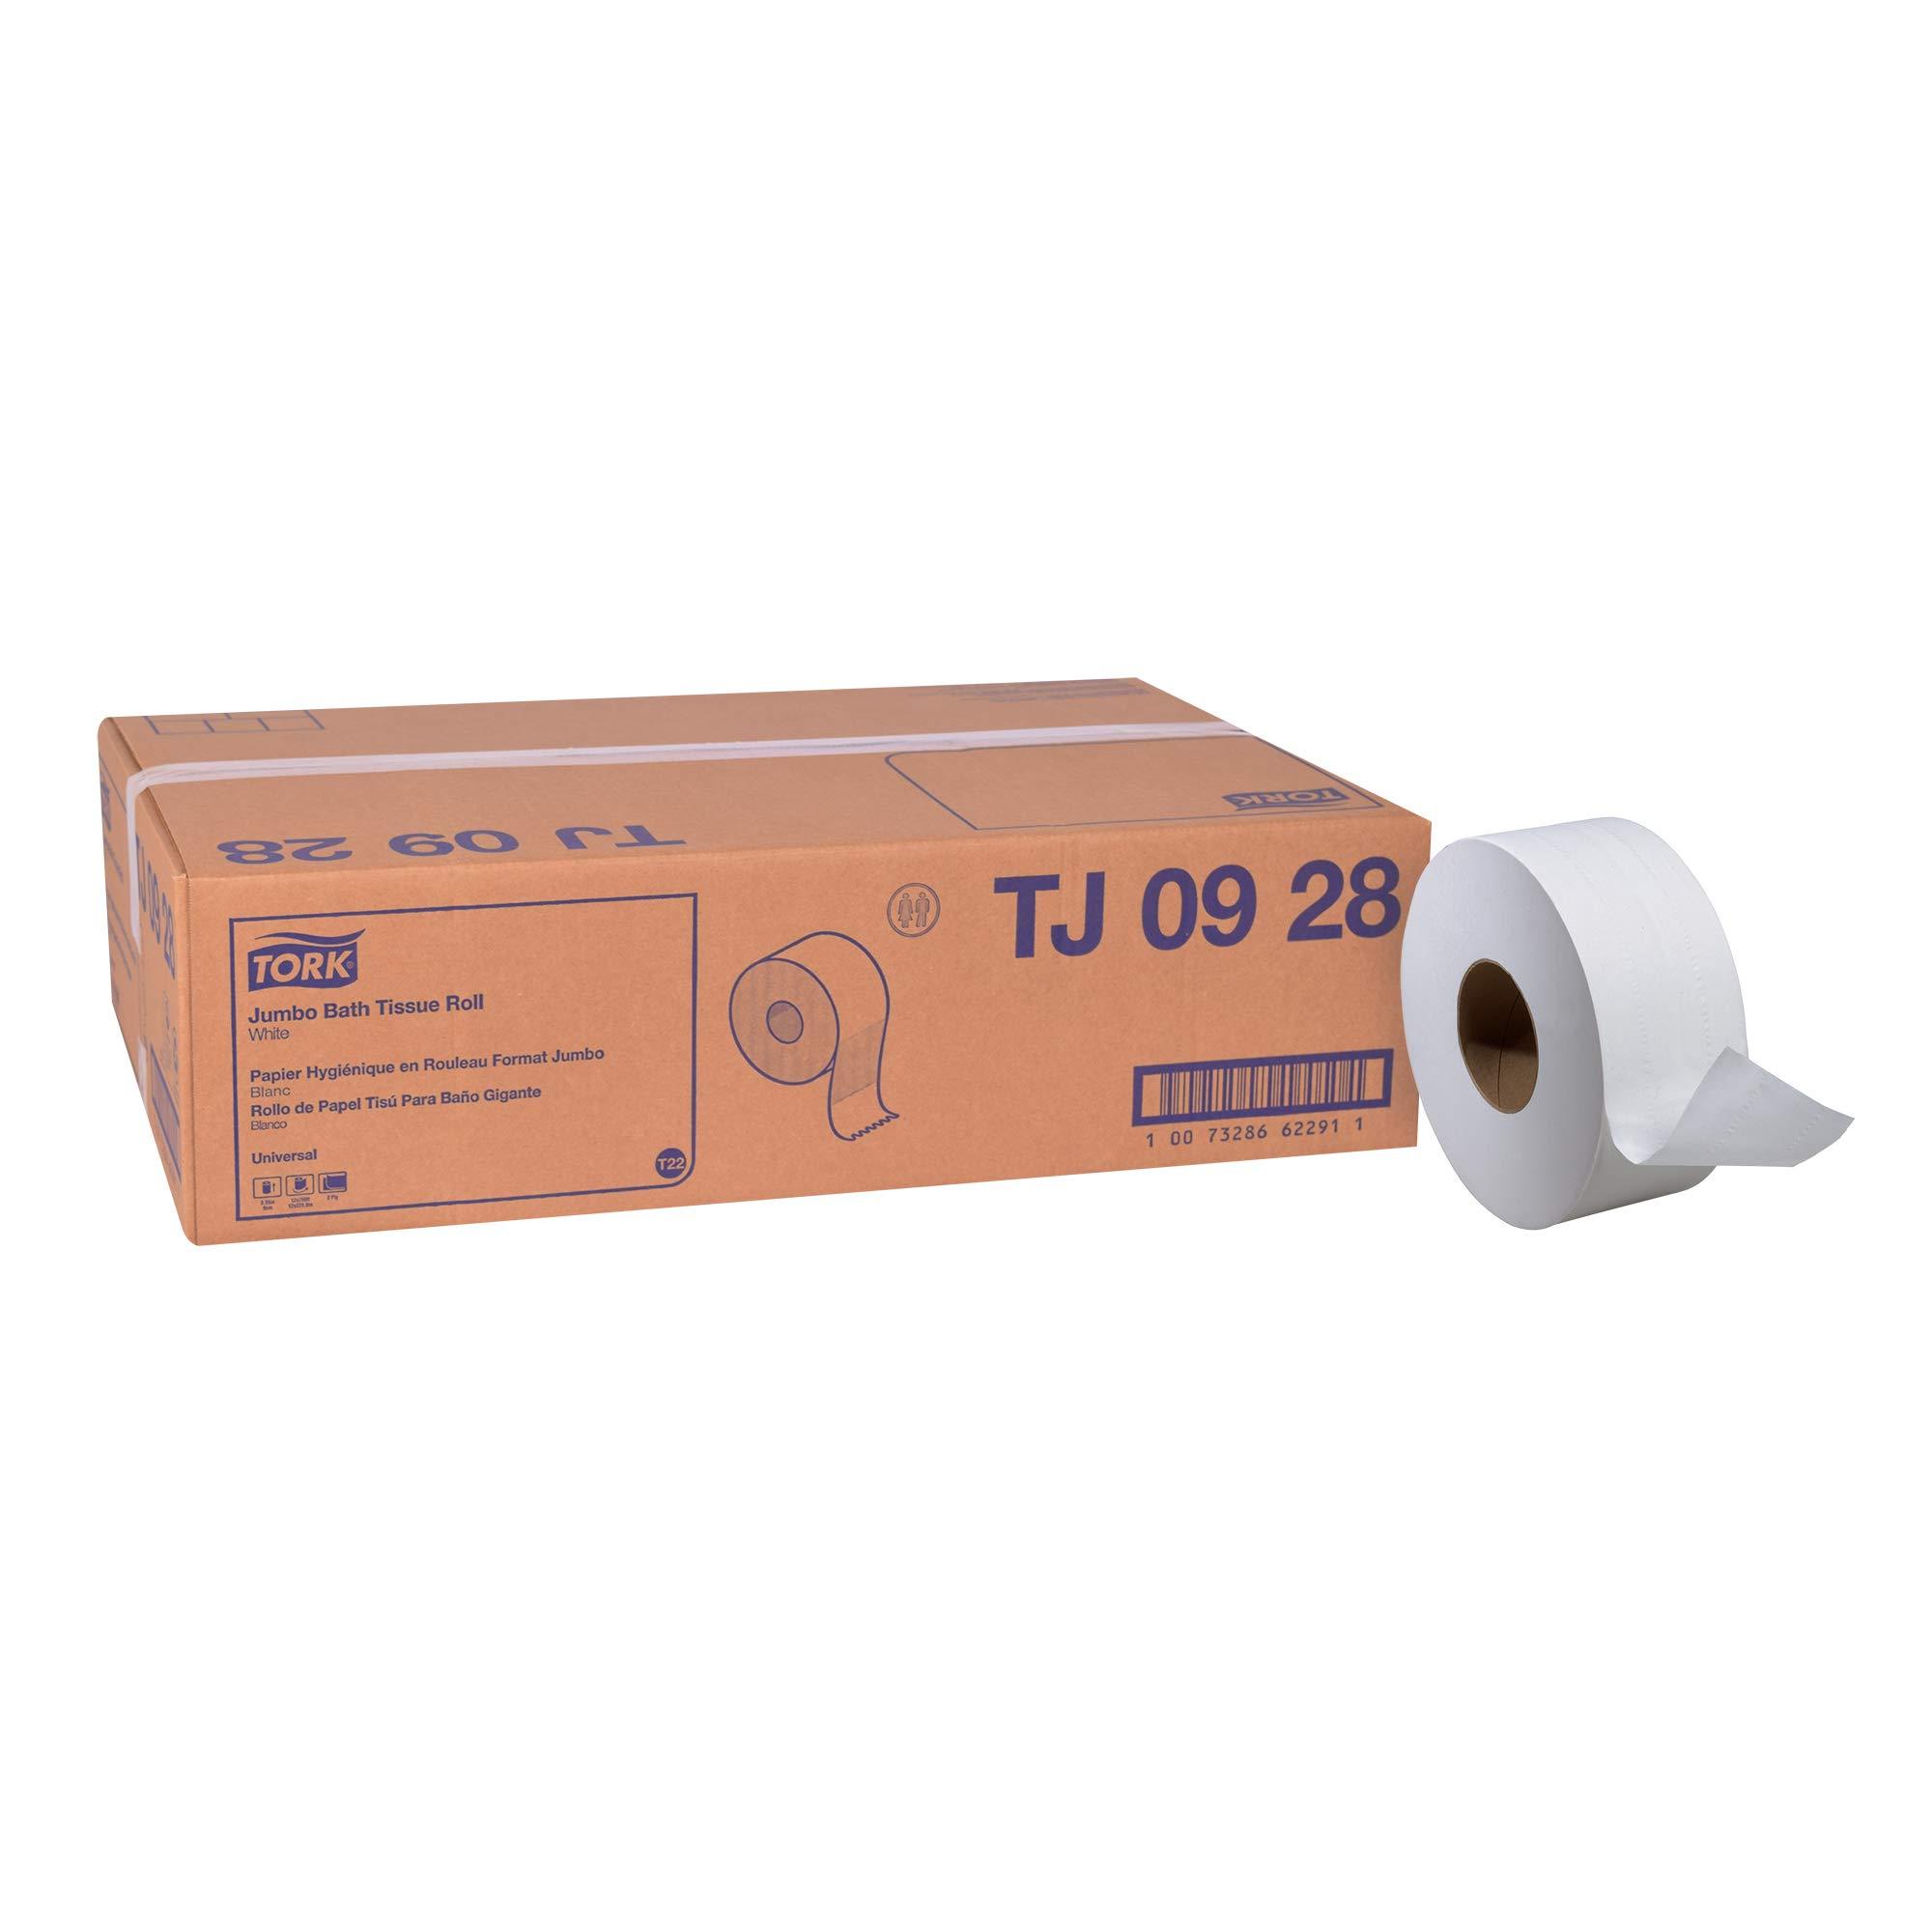 "Tork Universal TJ0928 Jumbo Bath Tissue Roll, 2-Ply, 8.8"" Dia., 3.55"" Width x 750' Length, White (Case of 12 Rolls, 750 Per Roll, 9,000 Feet)"